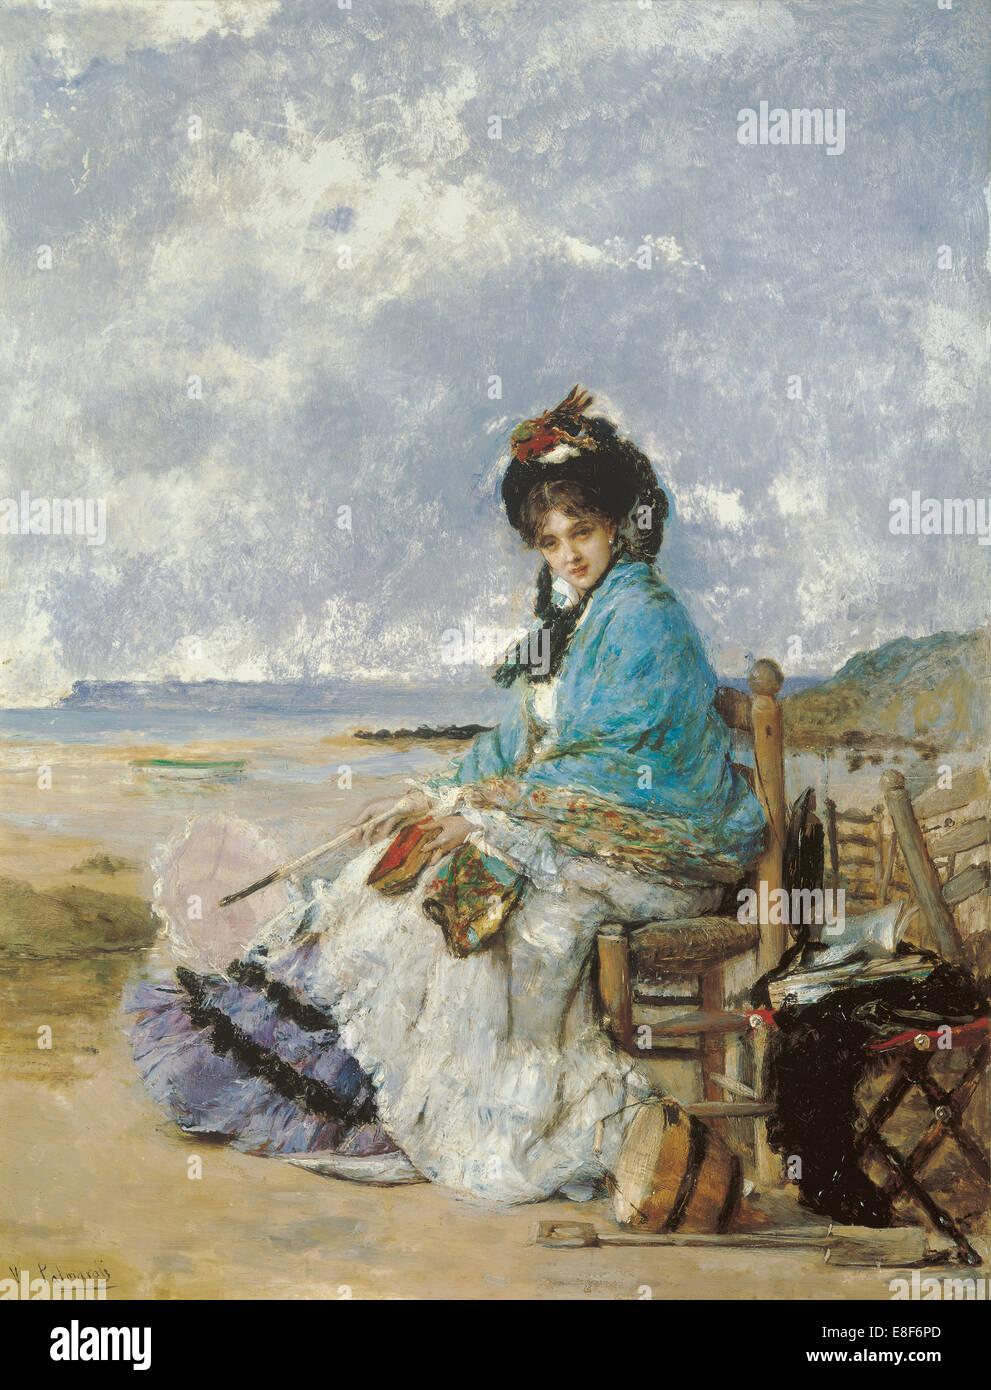 Summer Days. Artist: Palmaroli y Gónzalez, Vicente (1834-1896) - Stock Image